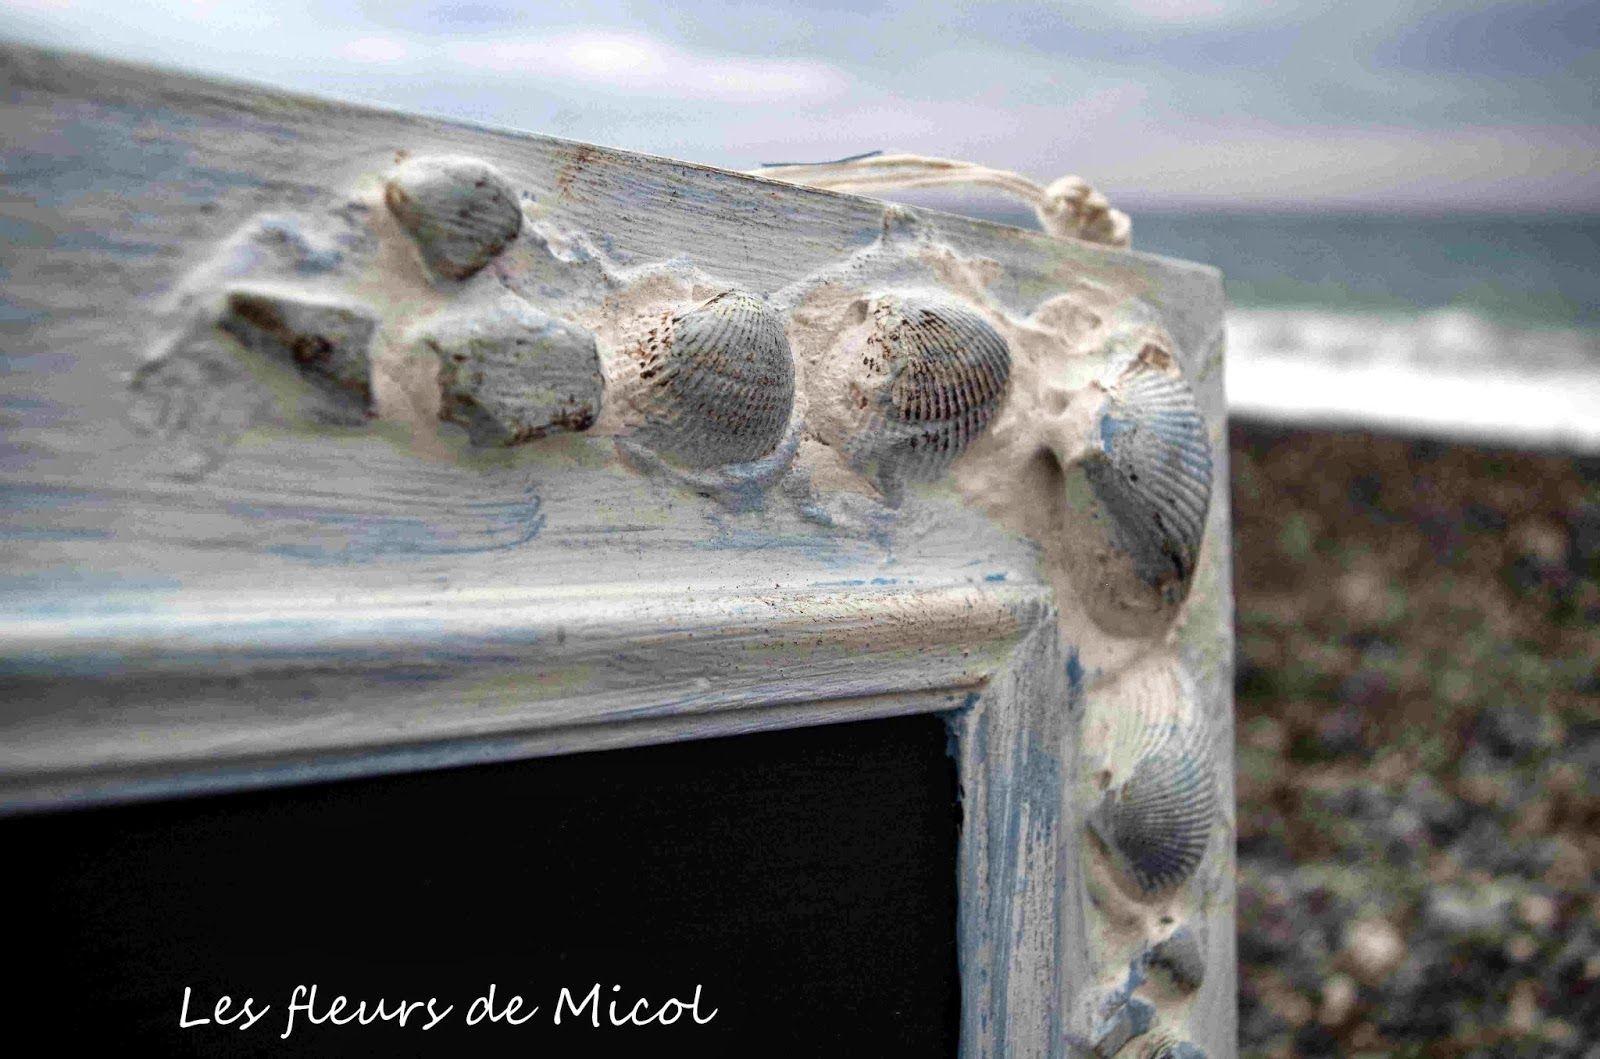 les fleurs de micol: TRA LE ONDE DEL MARE....